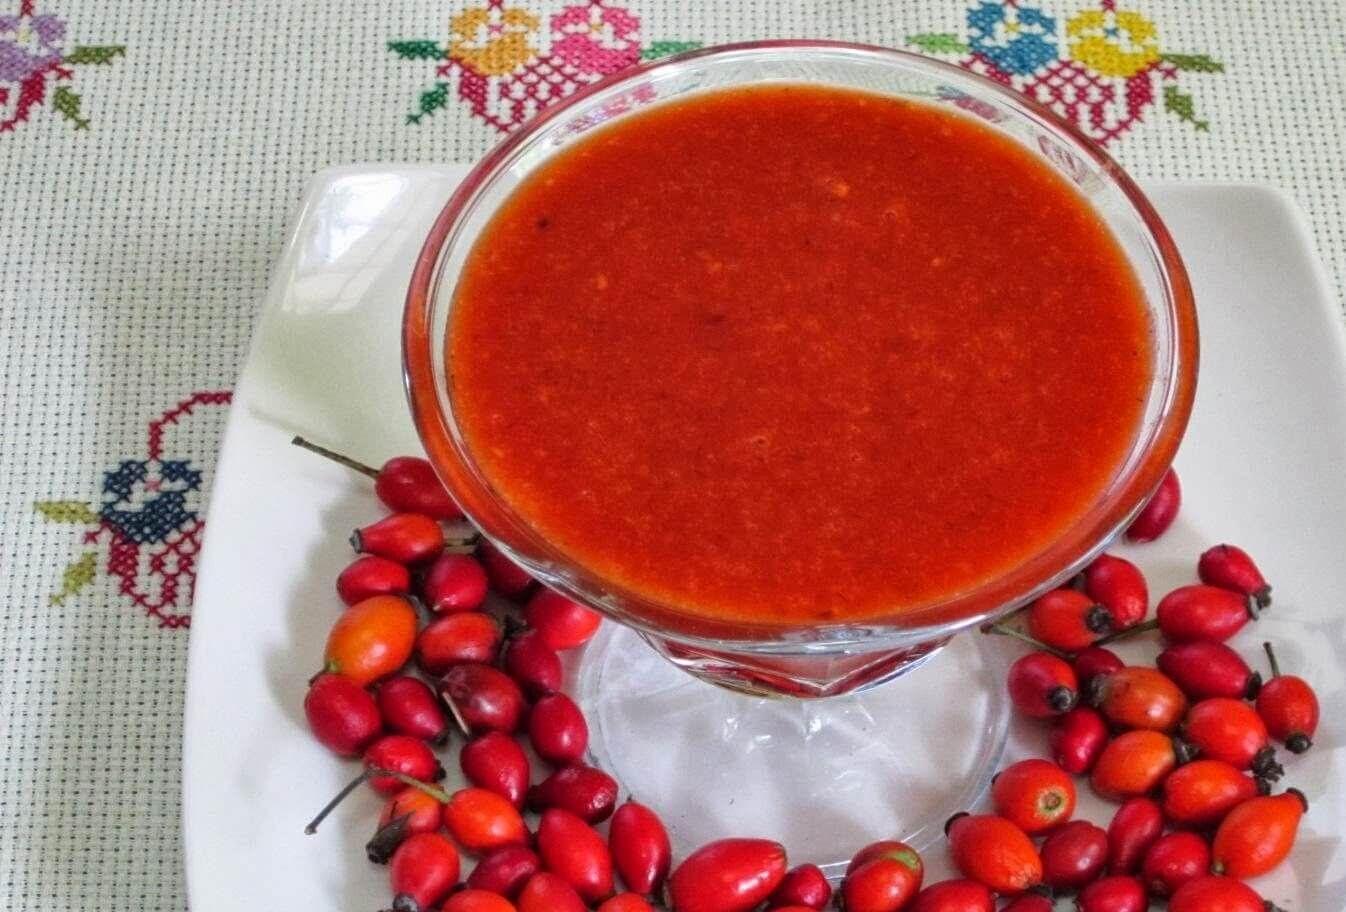 kusburnu-marmelati